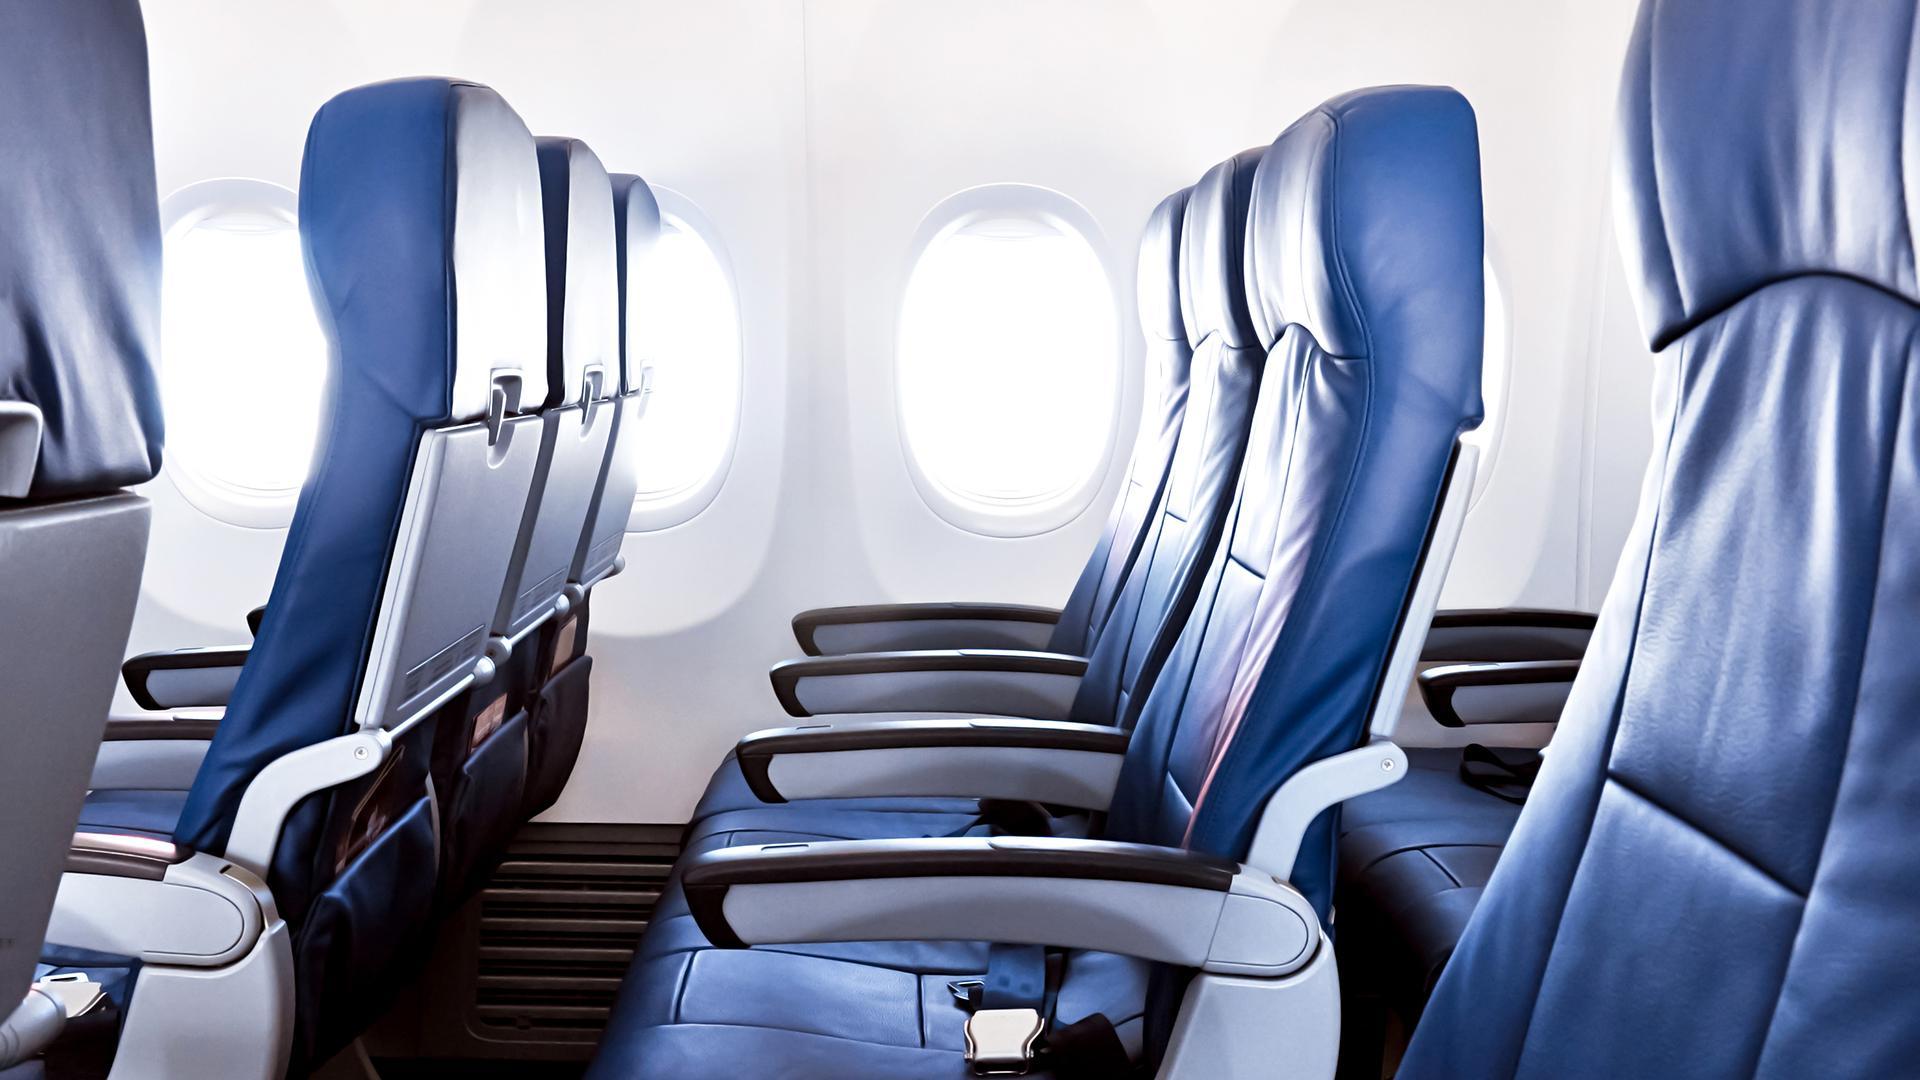 Terrific Best Seats On Airplane Rachael Ray Show Machost Co Dining Chair Design Ideas Machostcouk